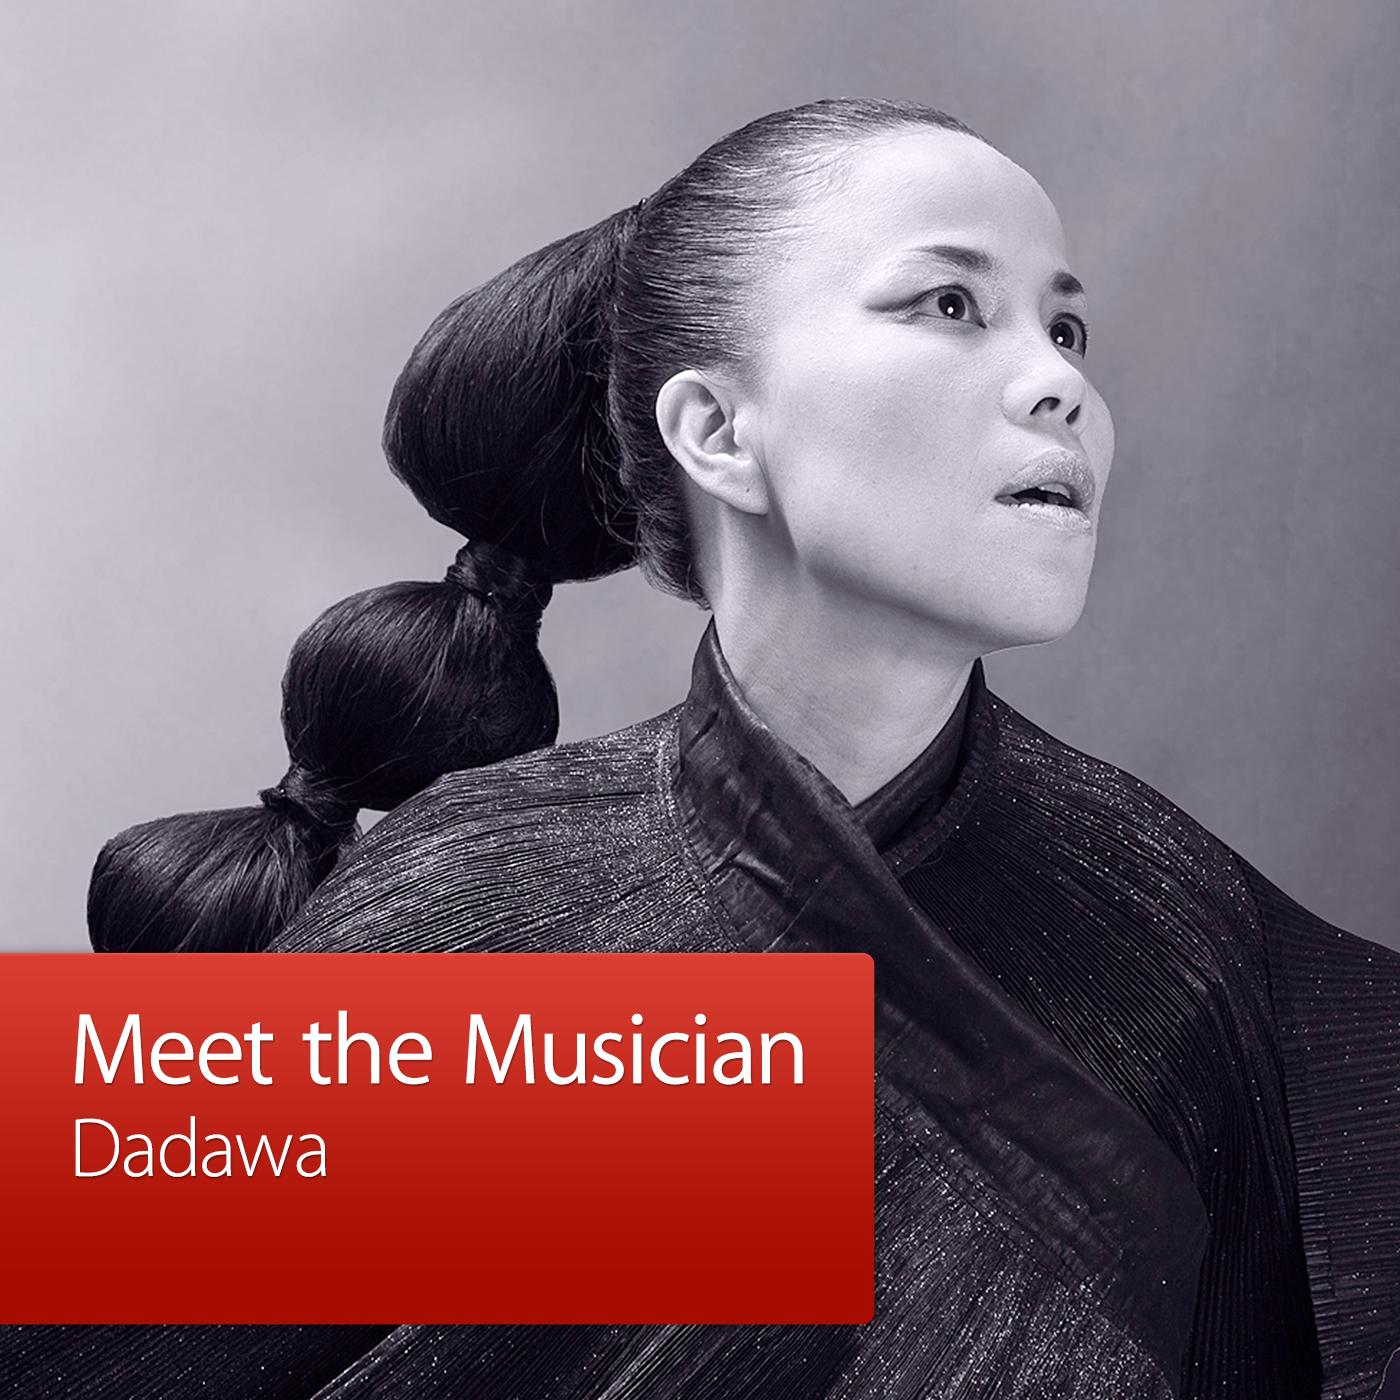 Dadawa: Meet the Musician